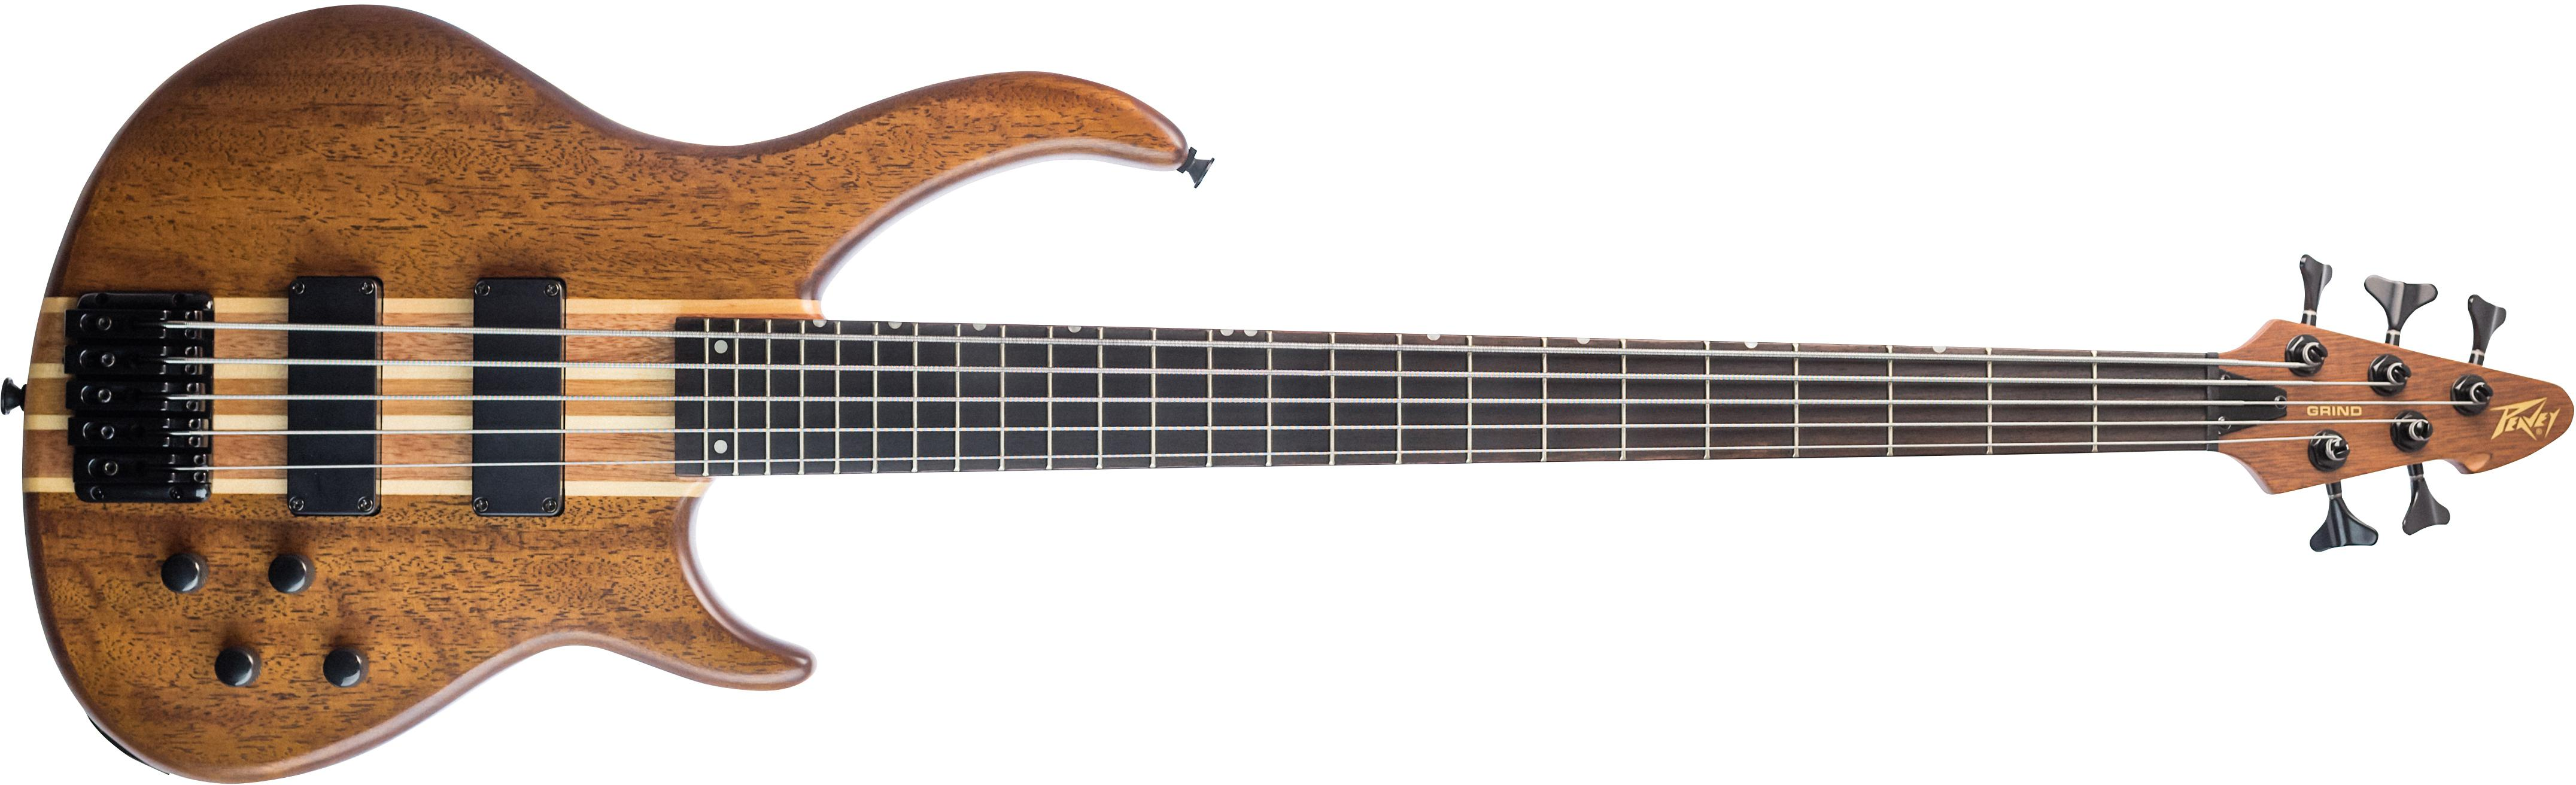 GrindTM Bass 5 Natural